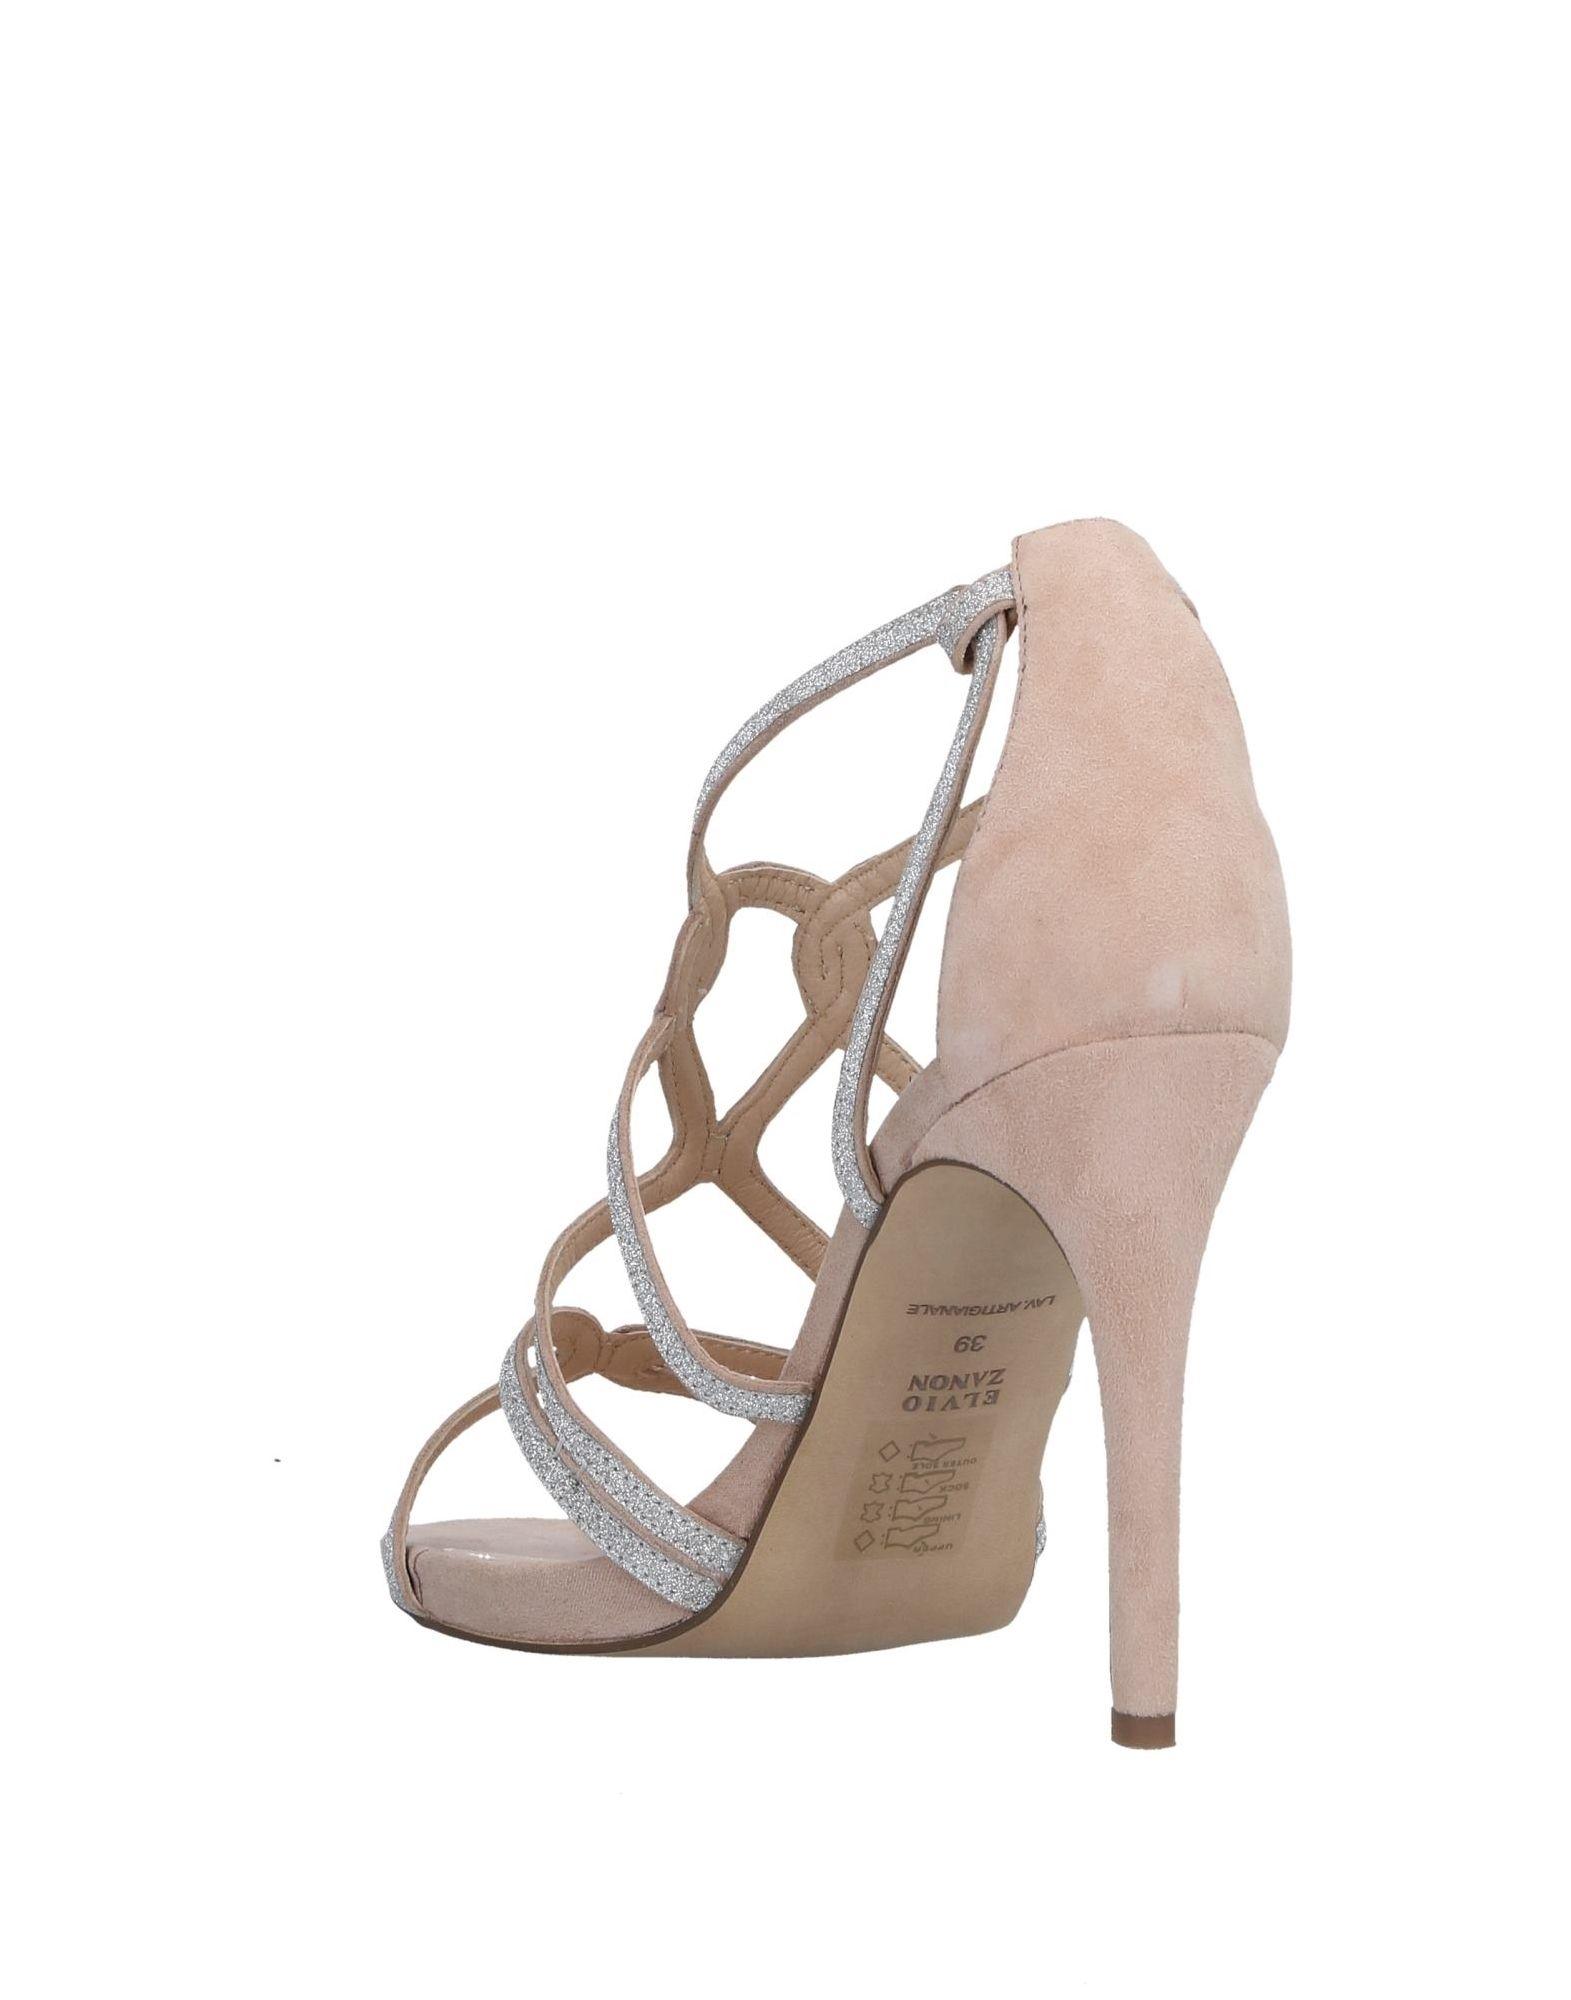 Elvio Zanon Sandalen Damen beliebte  11504725BK Gute Qualität beliebte Damen Schuhe a165e0